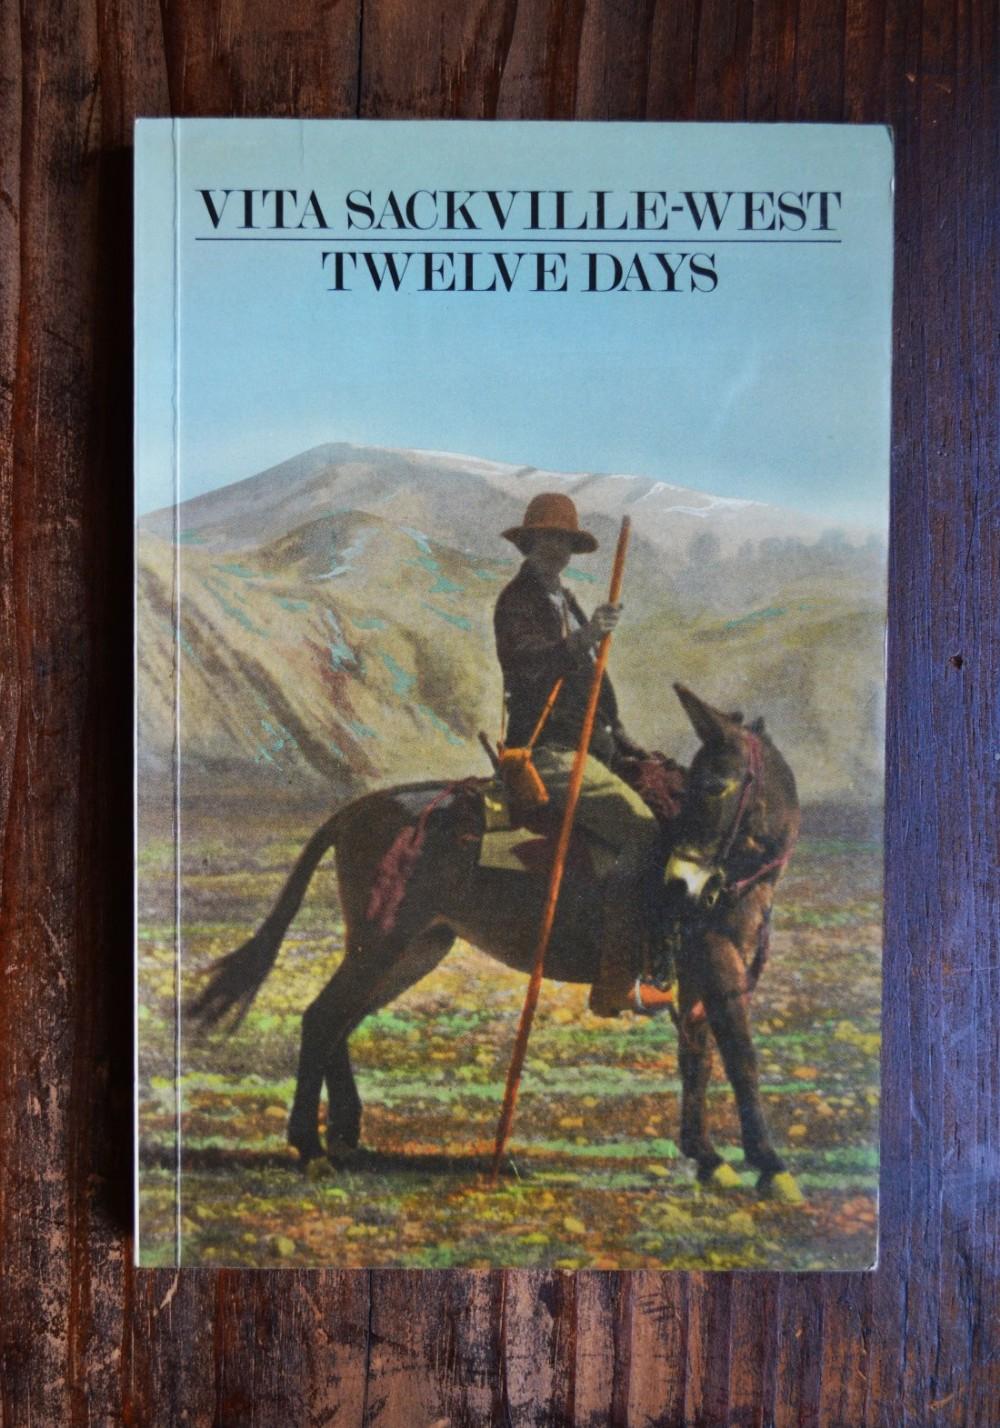 'twelve days' by vita sackvillewest